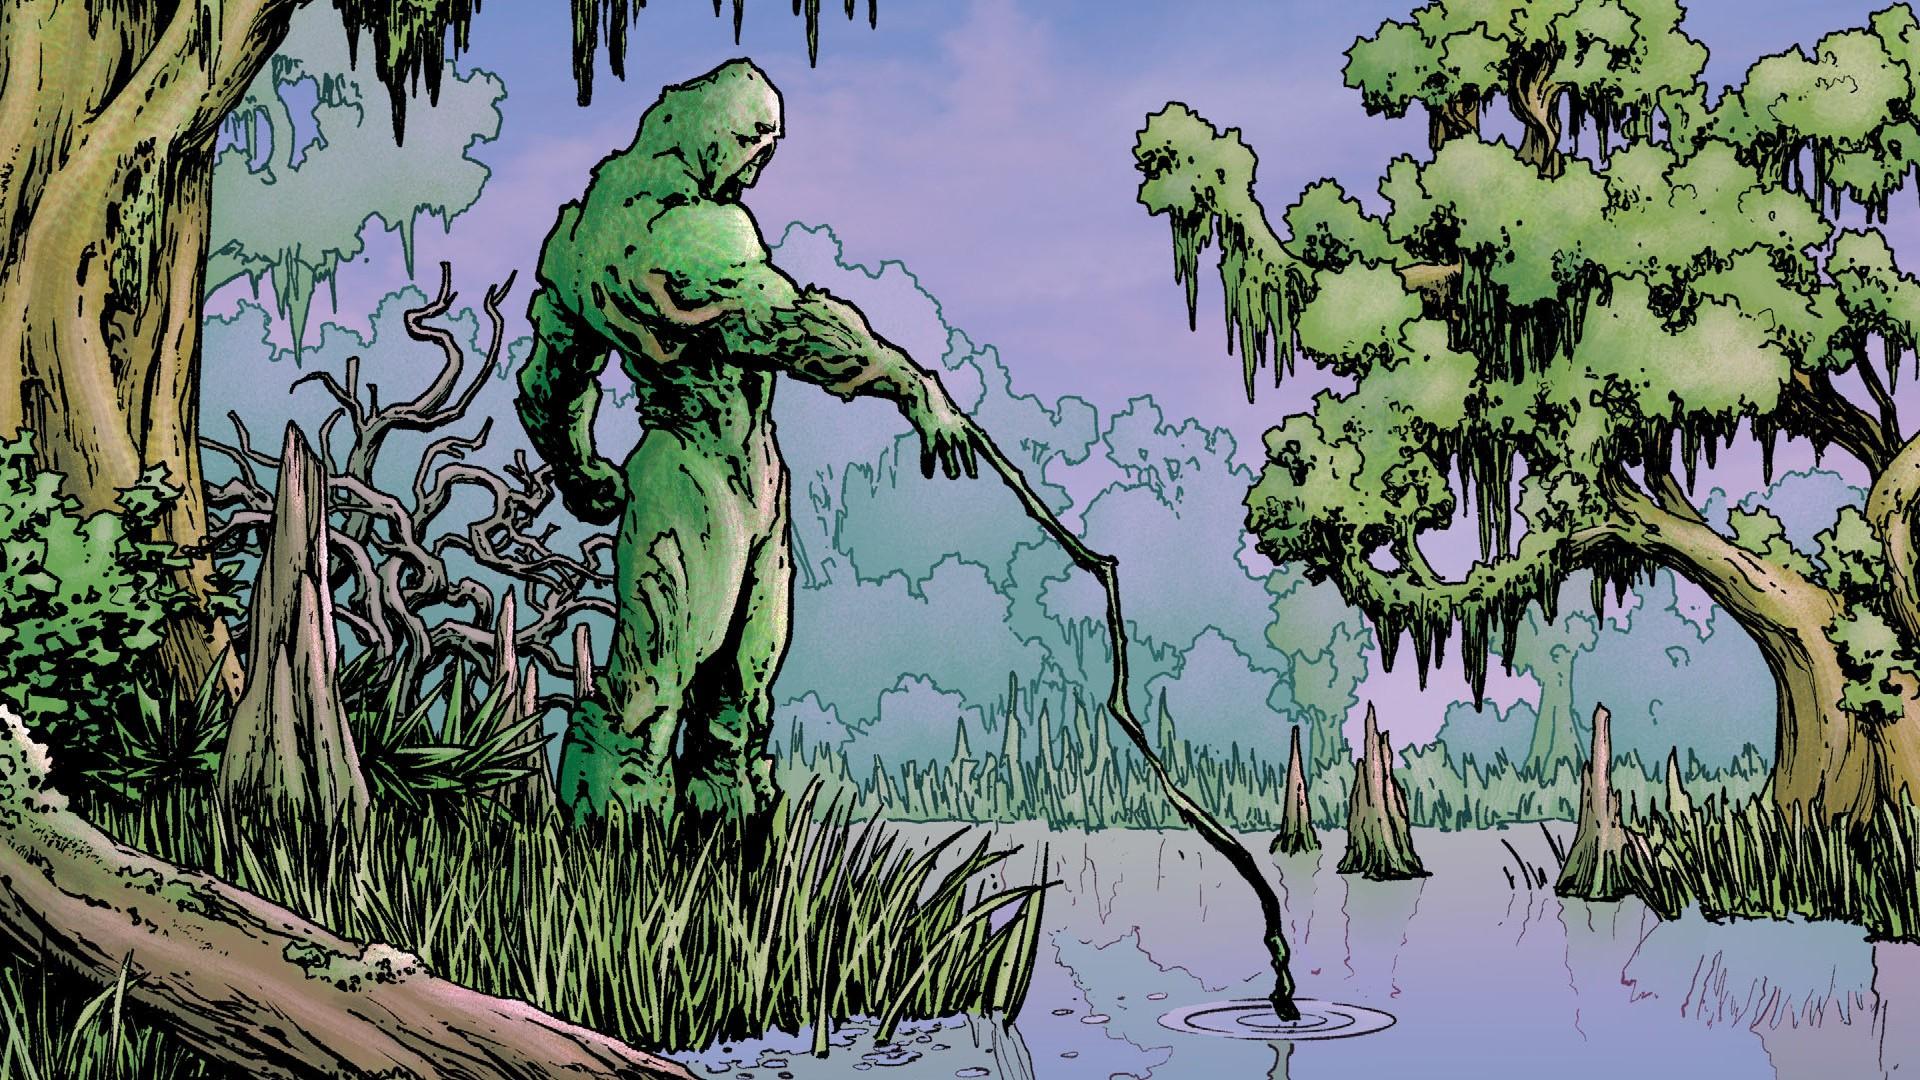 Fond d 39 cran for t illustration vert dessin anim for Plante jungle